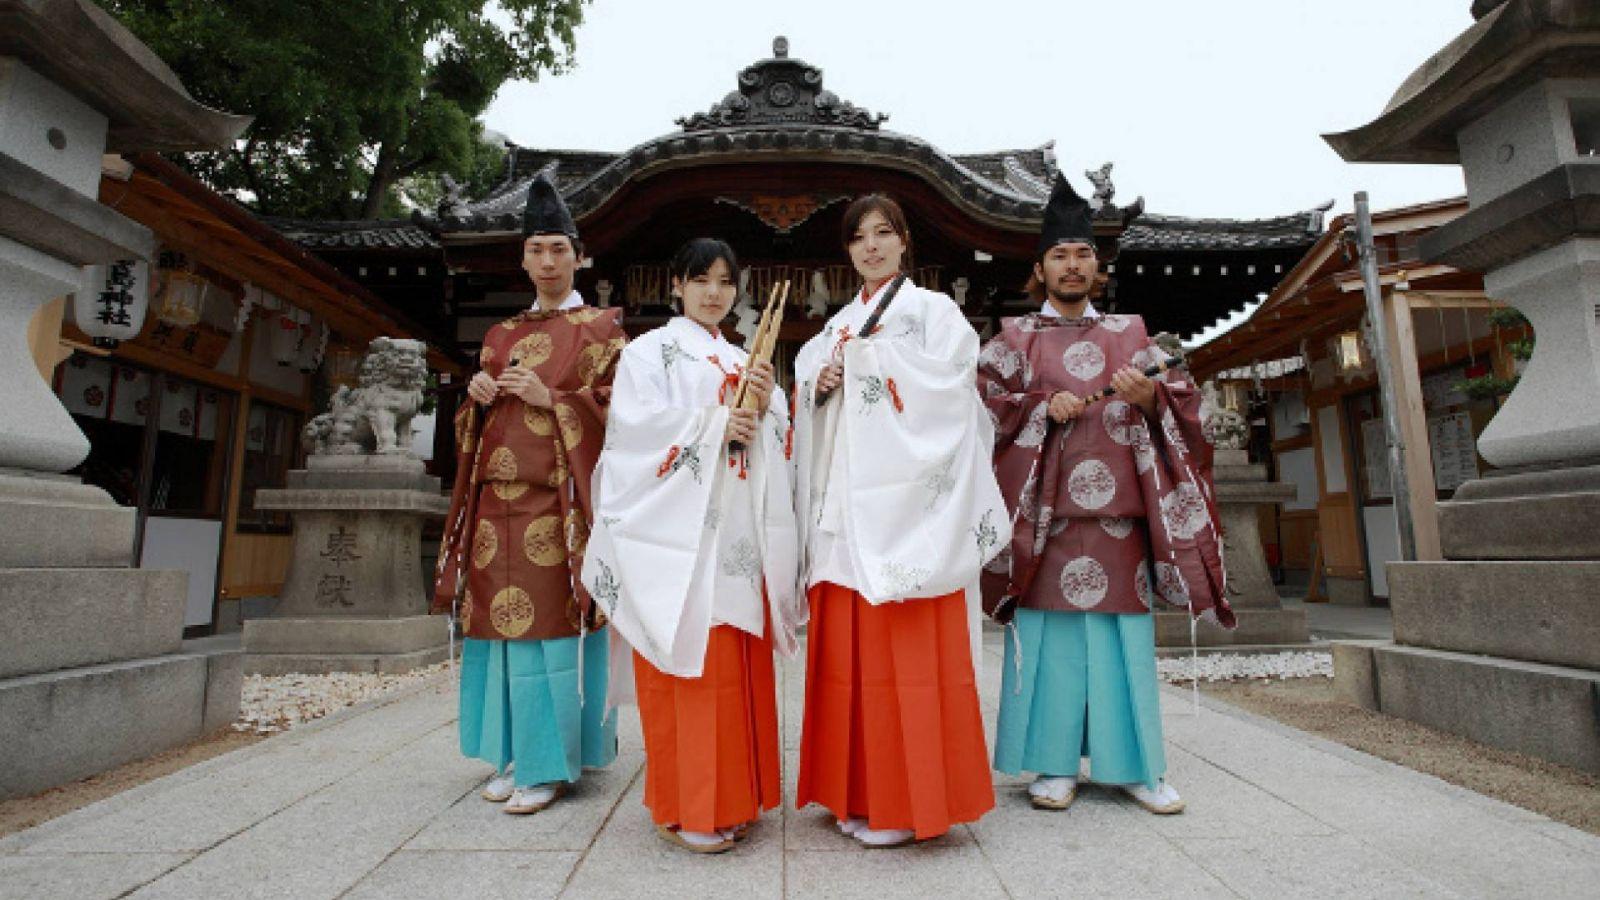 Asuka from Tenchigagaku © EURO JAPAN COMICS - Asuka